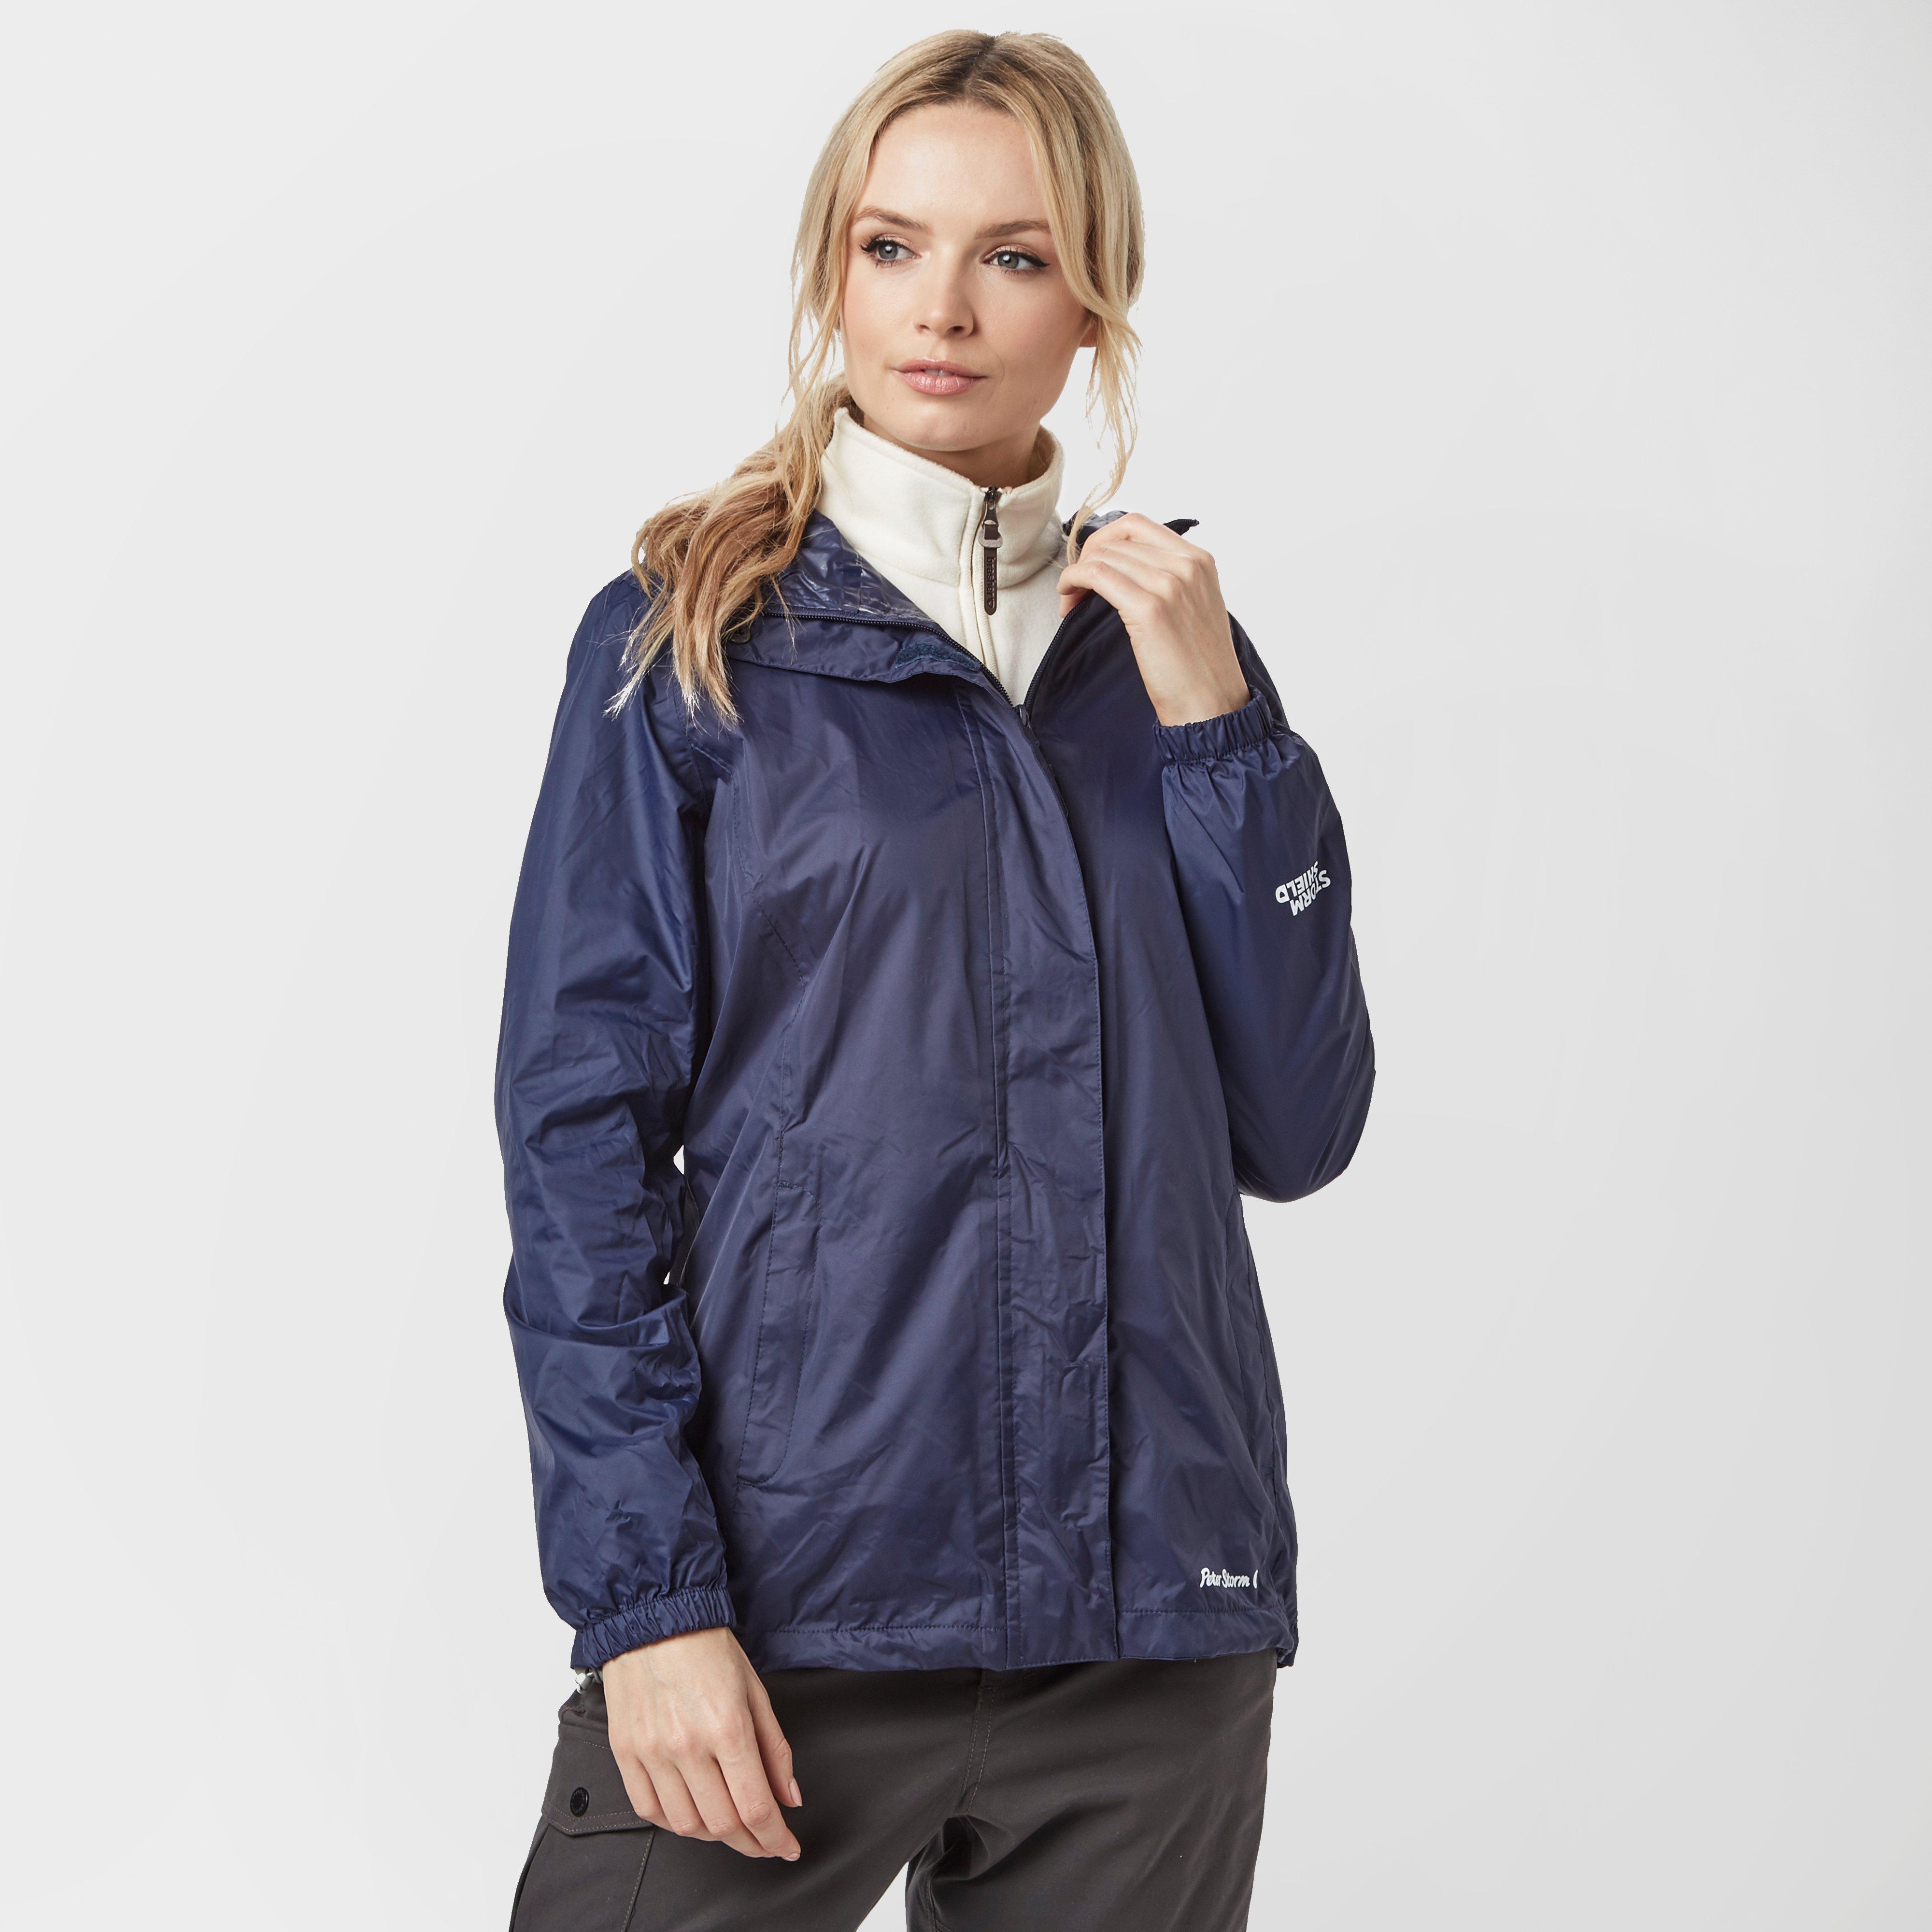 Peter Storm Women's Packable Hooded Jacket, Navy